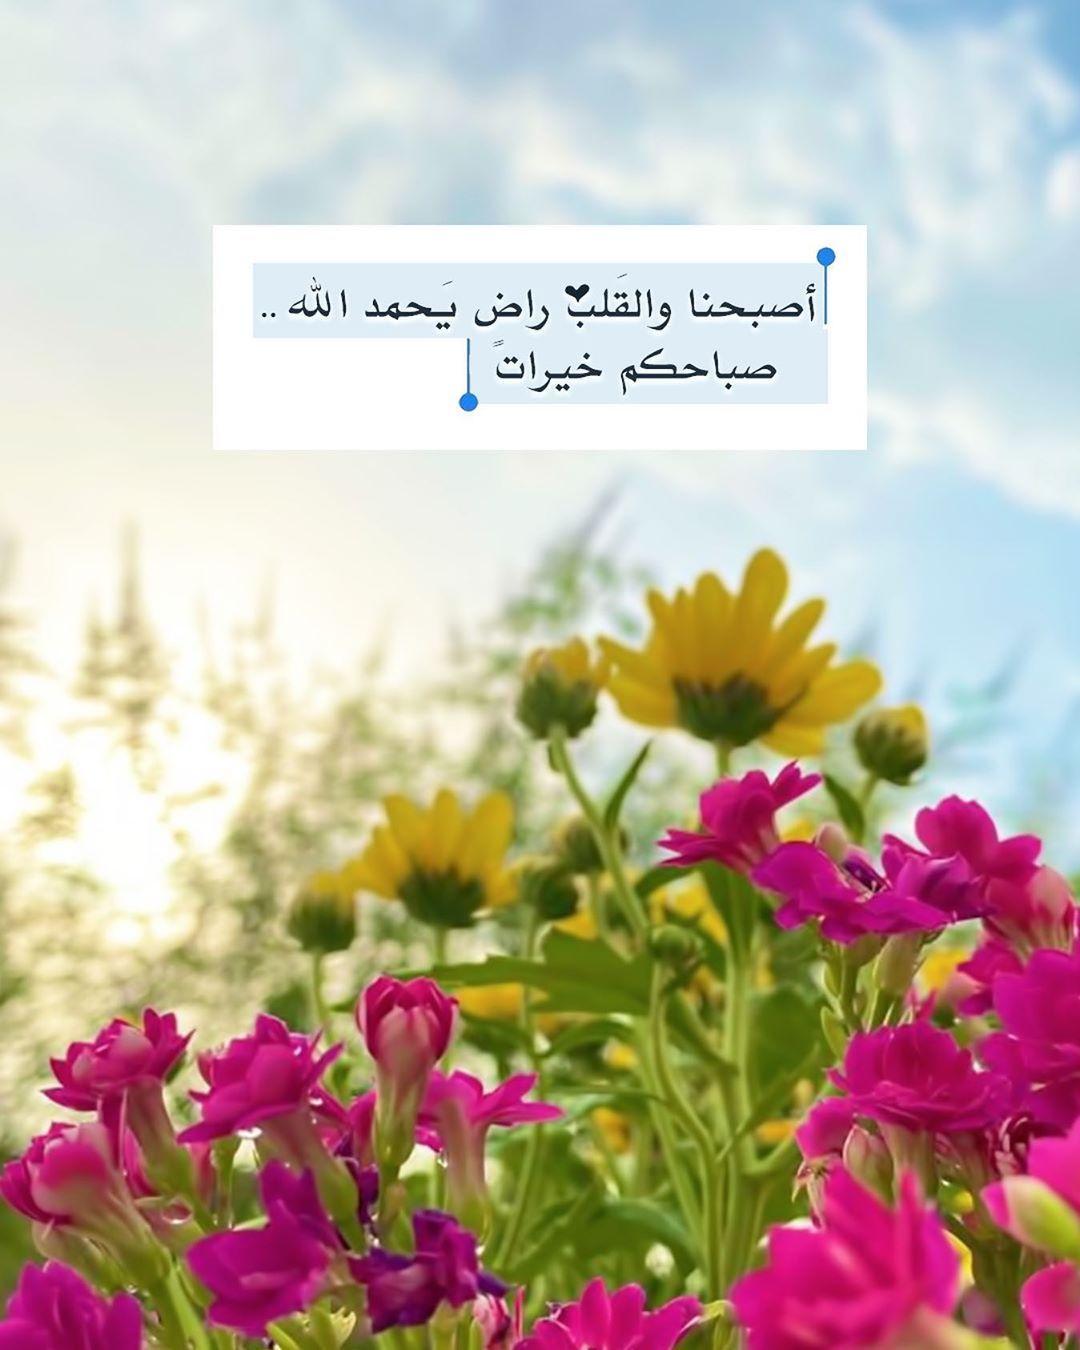 Pin By Aida Alrohili On صباح الخير Good Morning Morning Images Plants Image